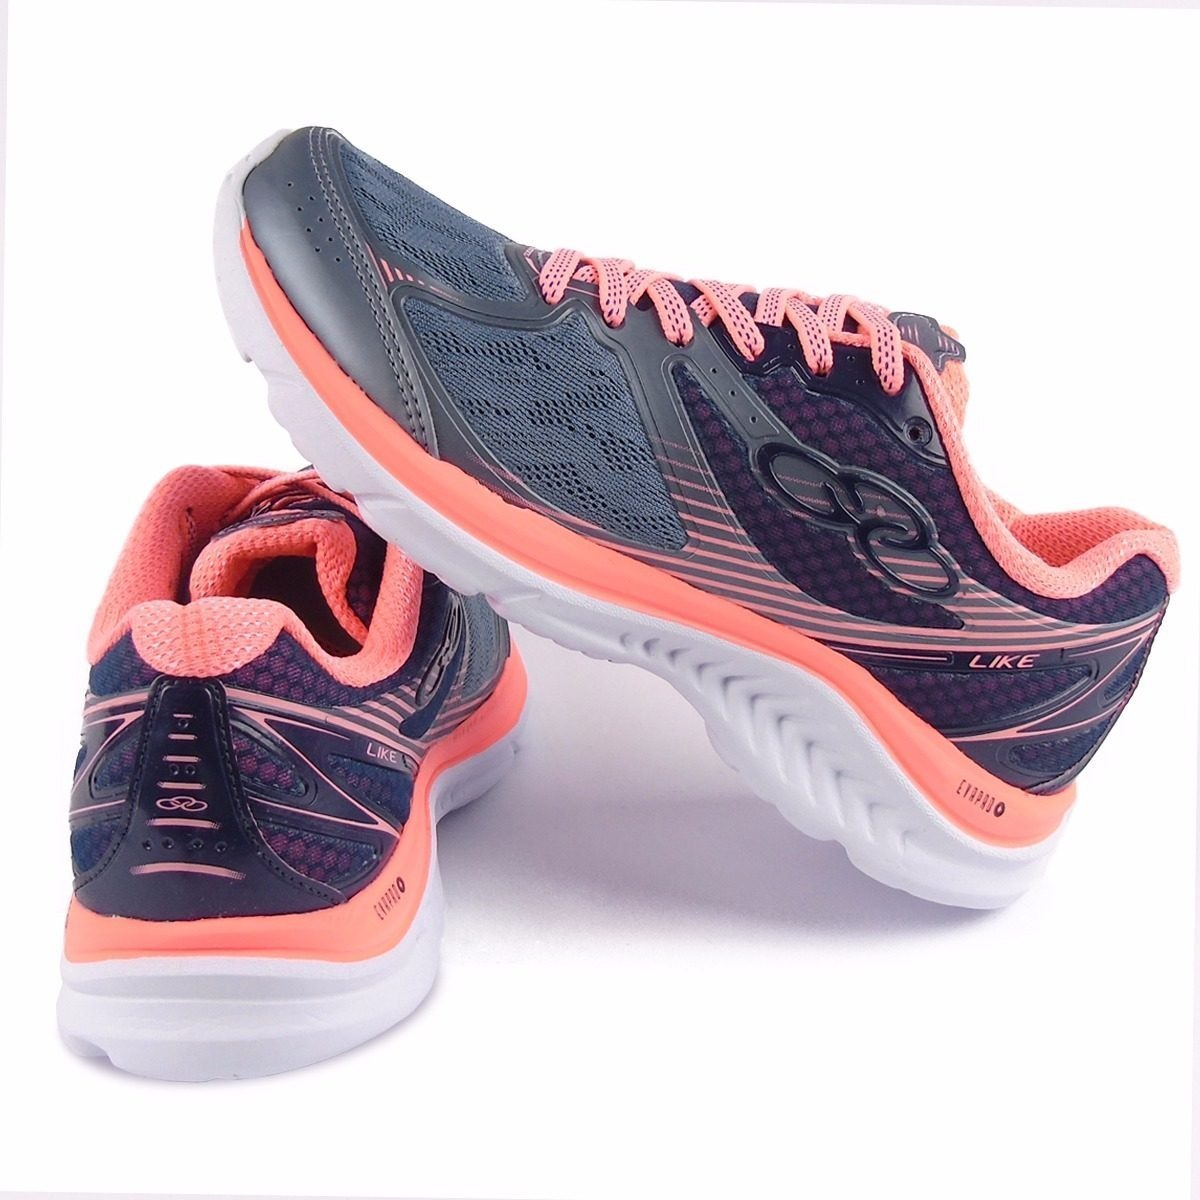 5353f342538 tênis olympikus like feminino corrida caminhadas original. Carregando zoom.